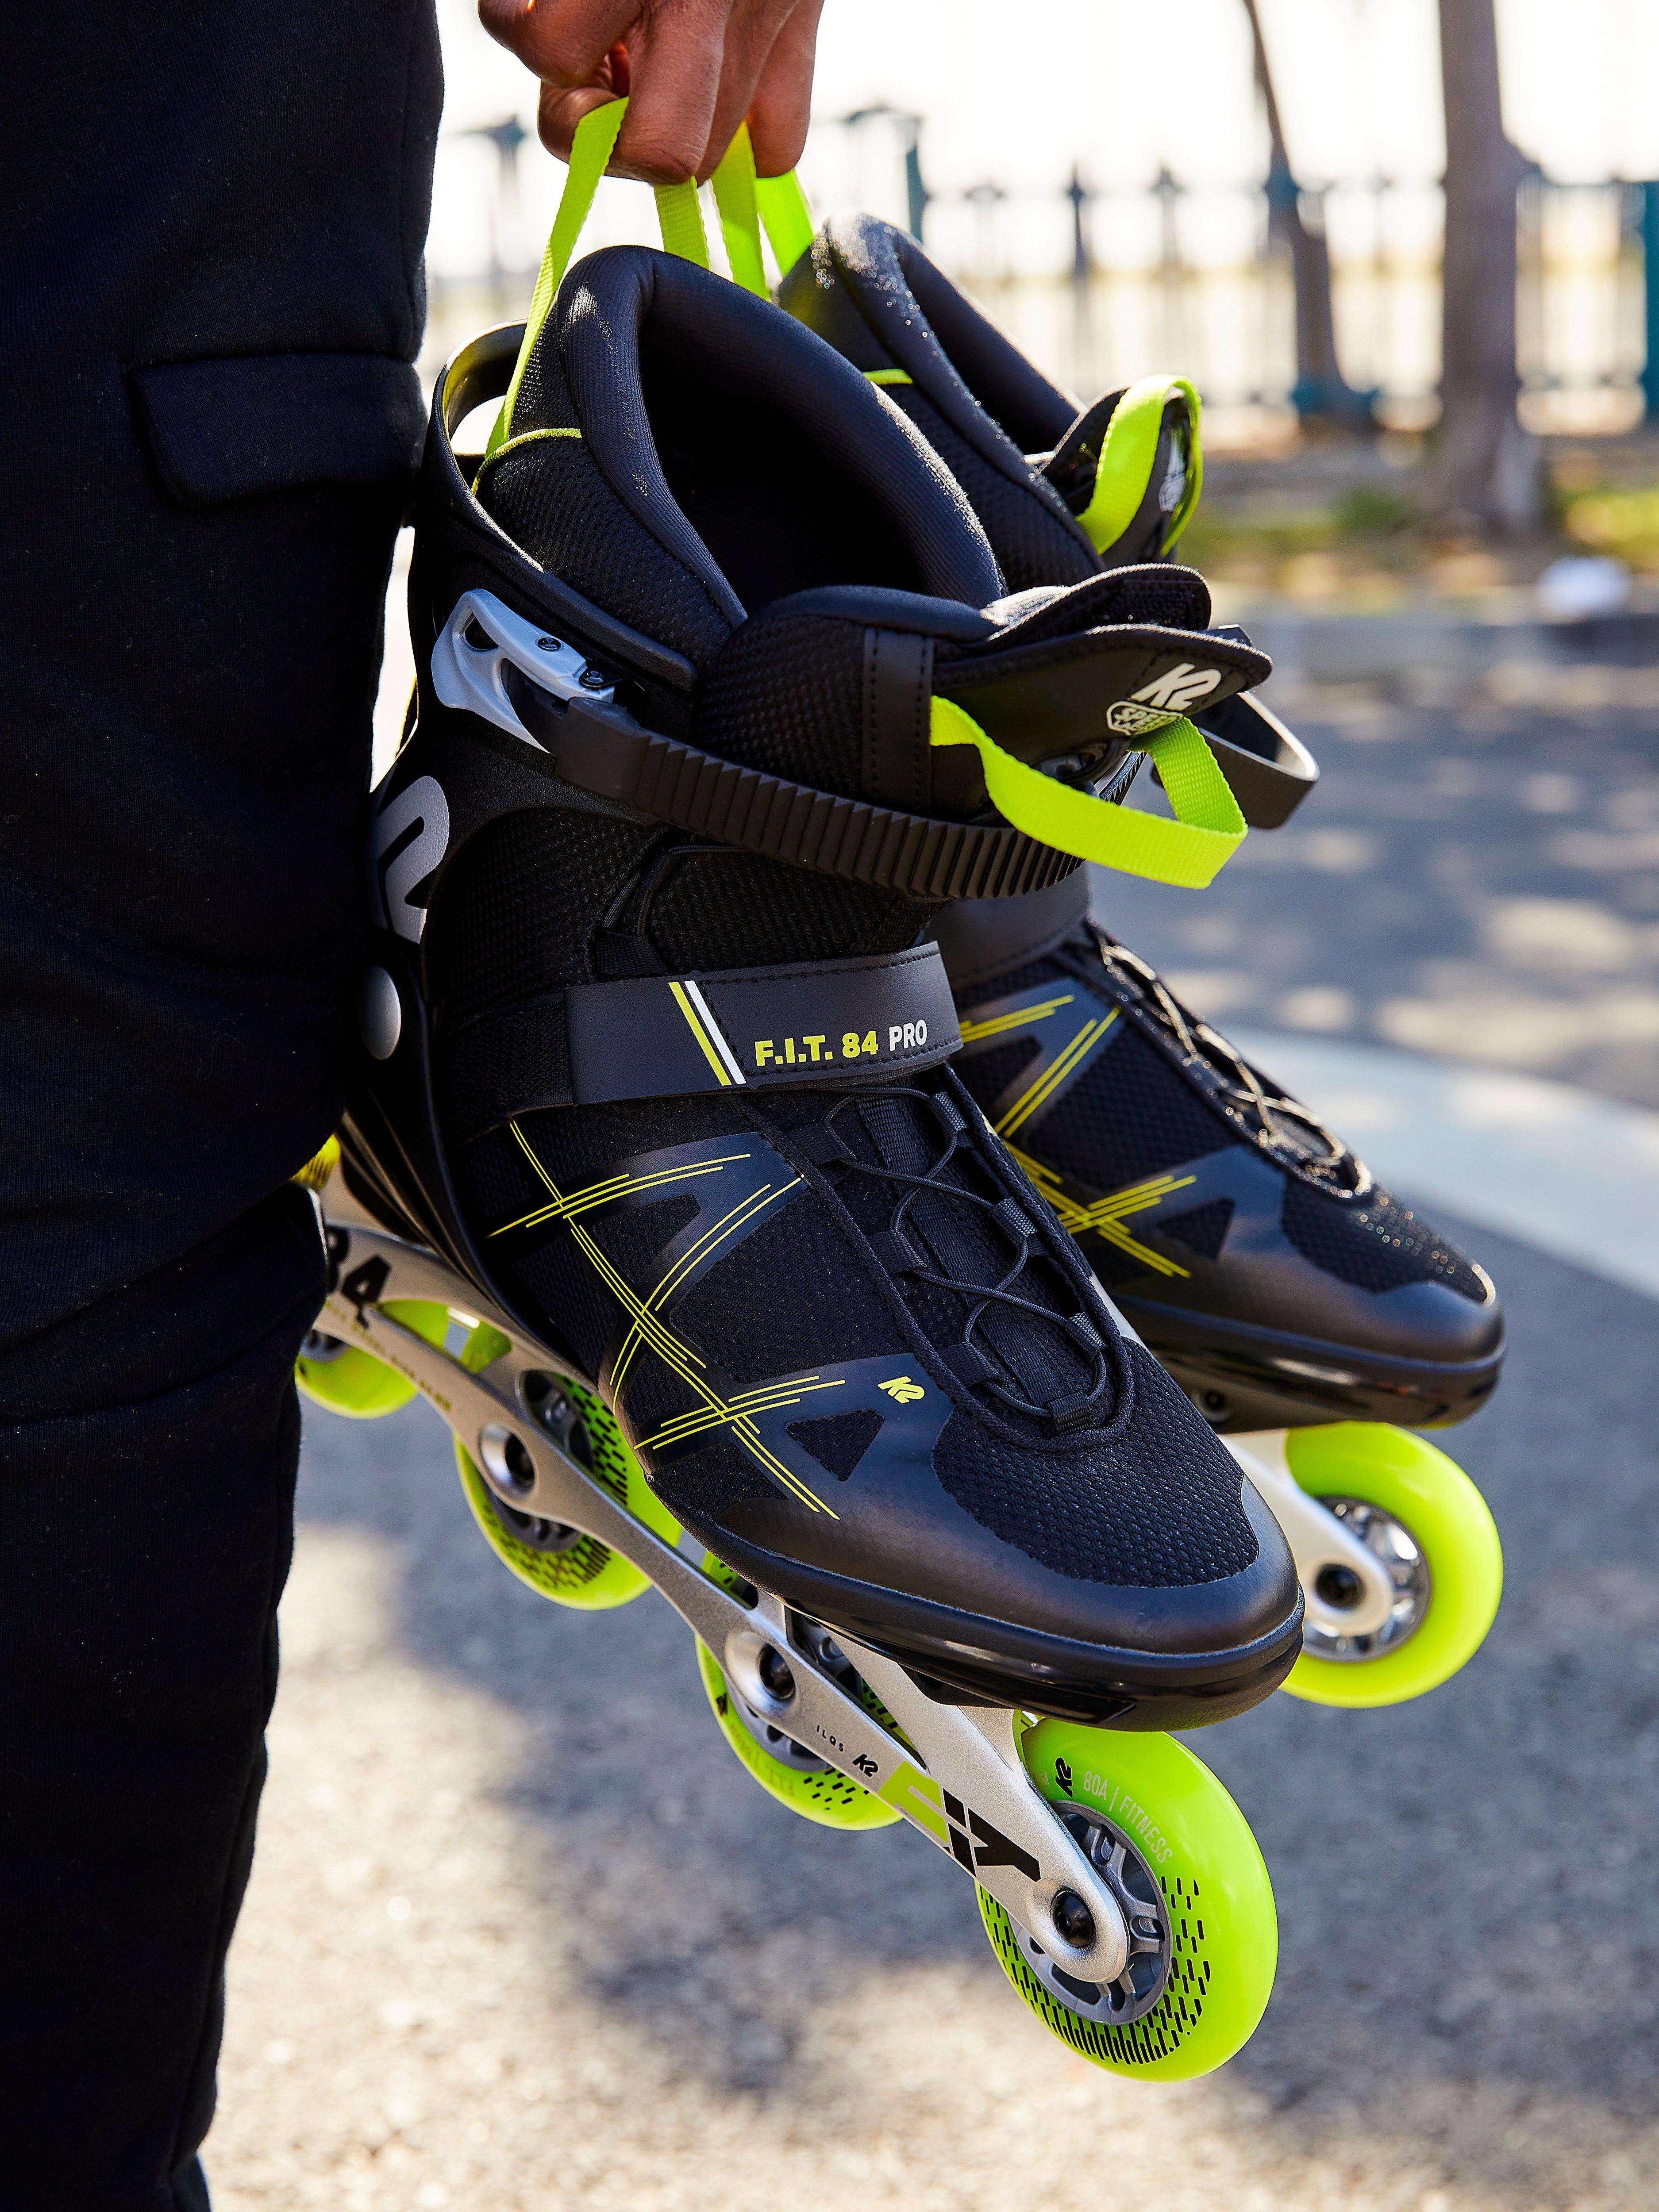 84 Pro Inline Skate K2 Skate F.I.T